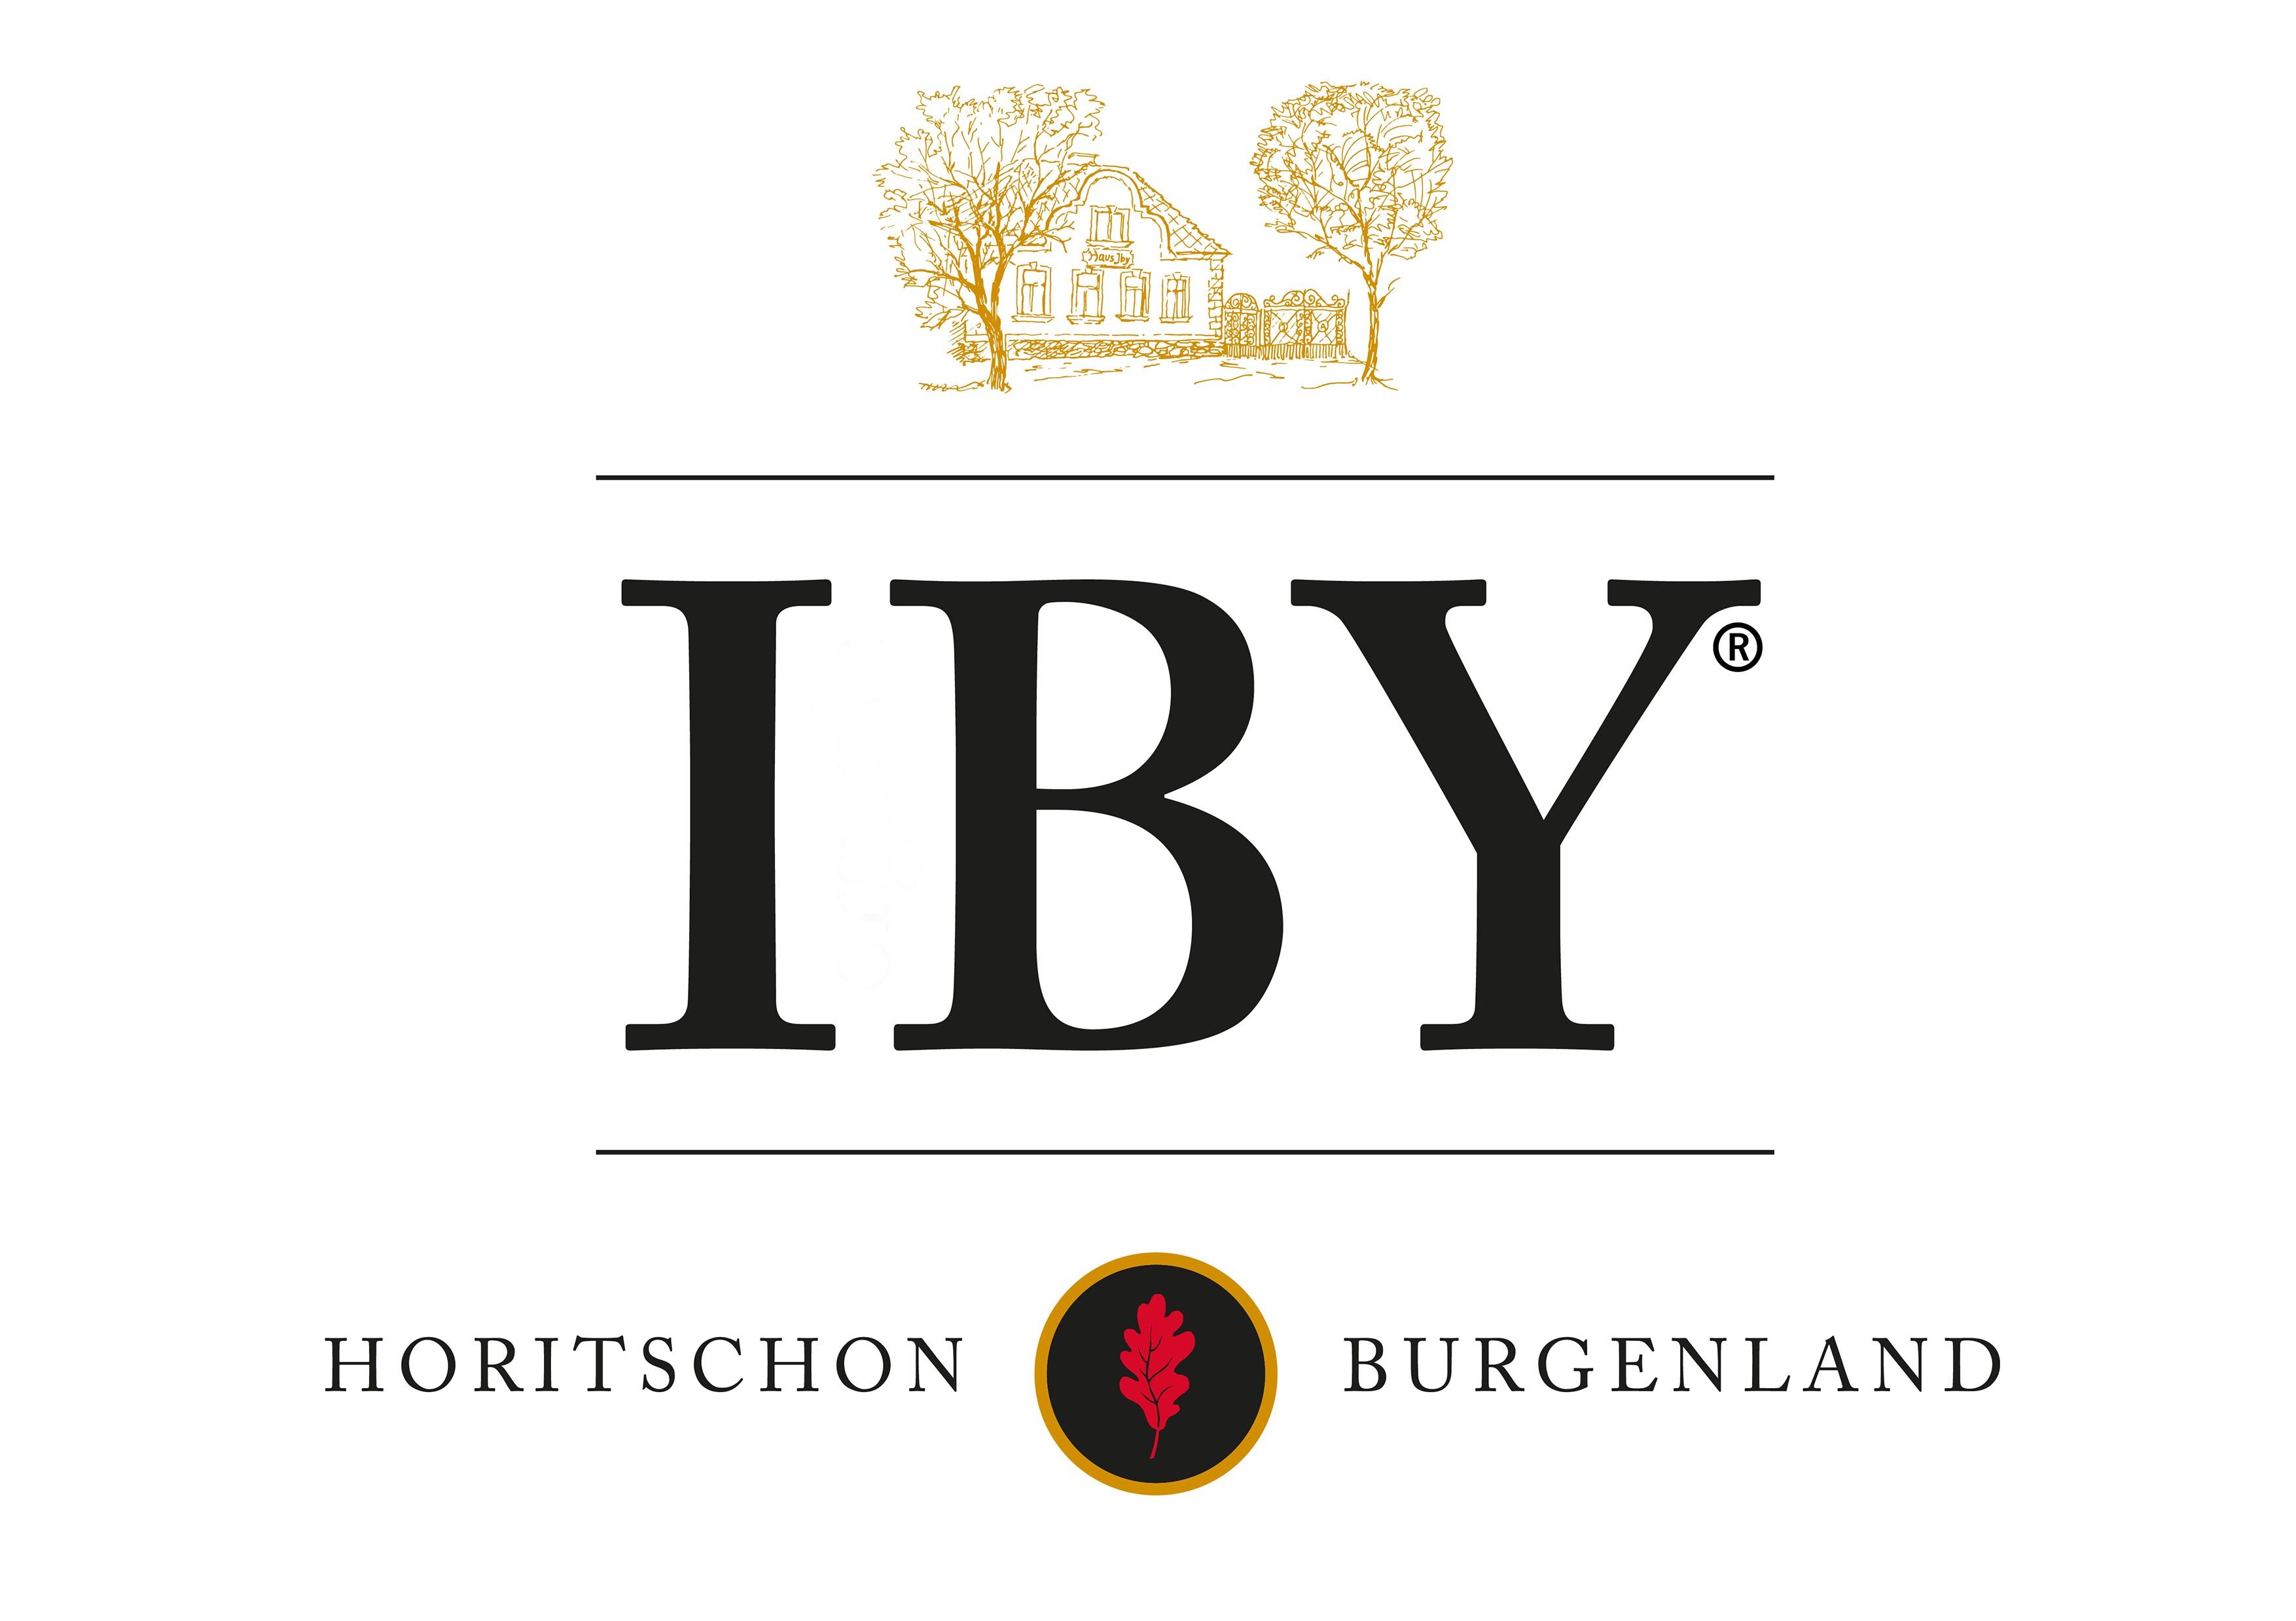 Iby (Burgenland)